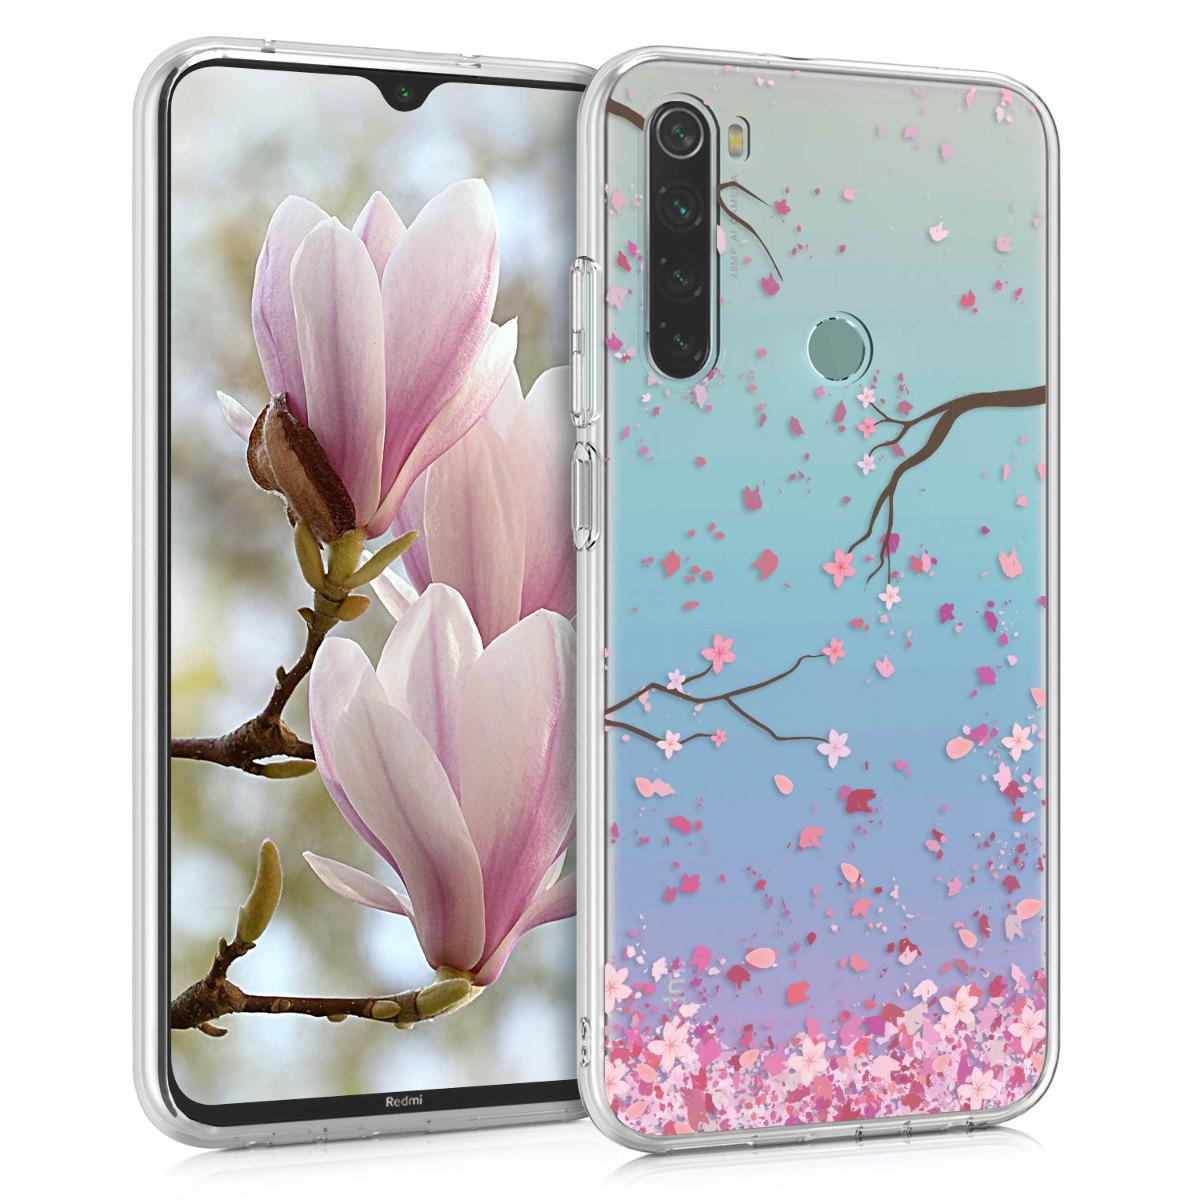 KW Θήκη Σιλικόνης Xiaomi Redmi Note 8 - Cherry Blossoms - Light Pink / Dark Brown / Transparent (50182.04)